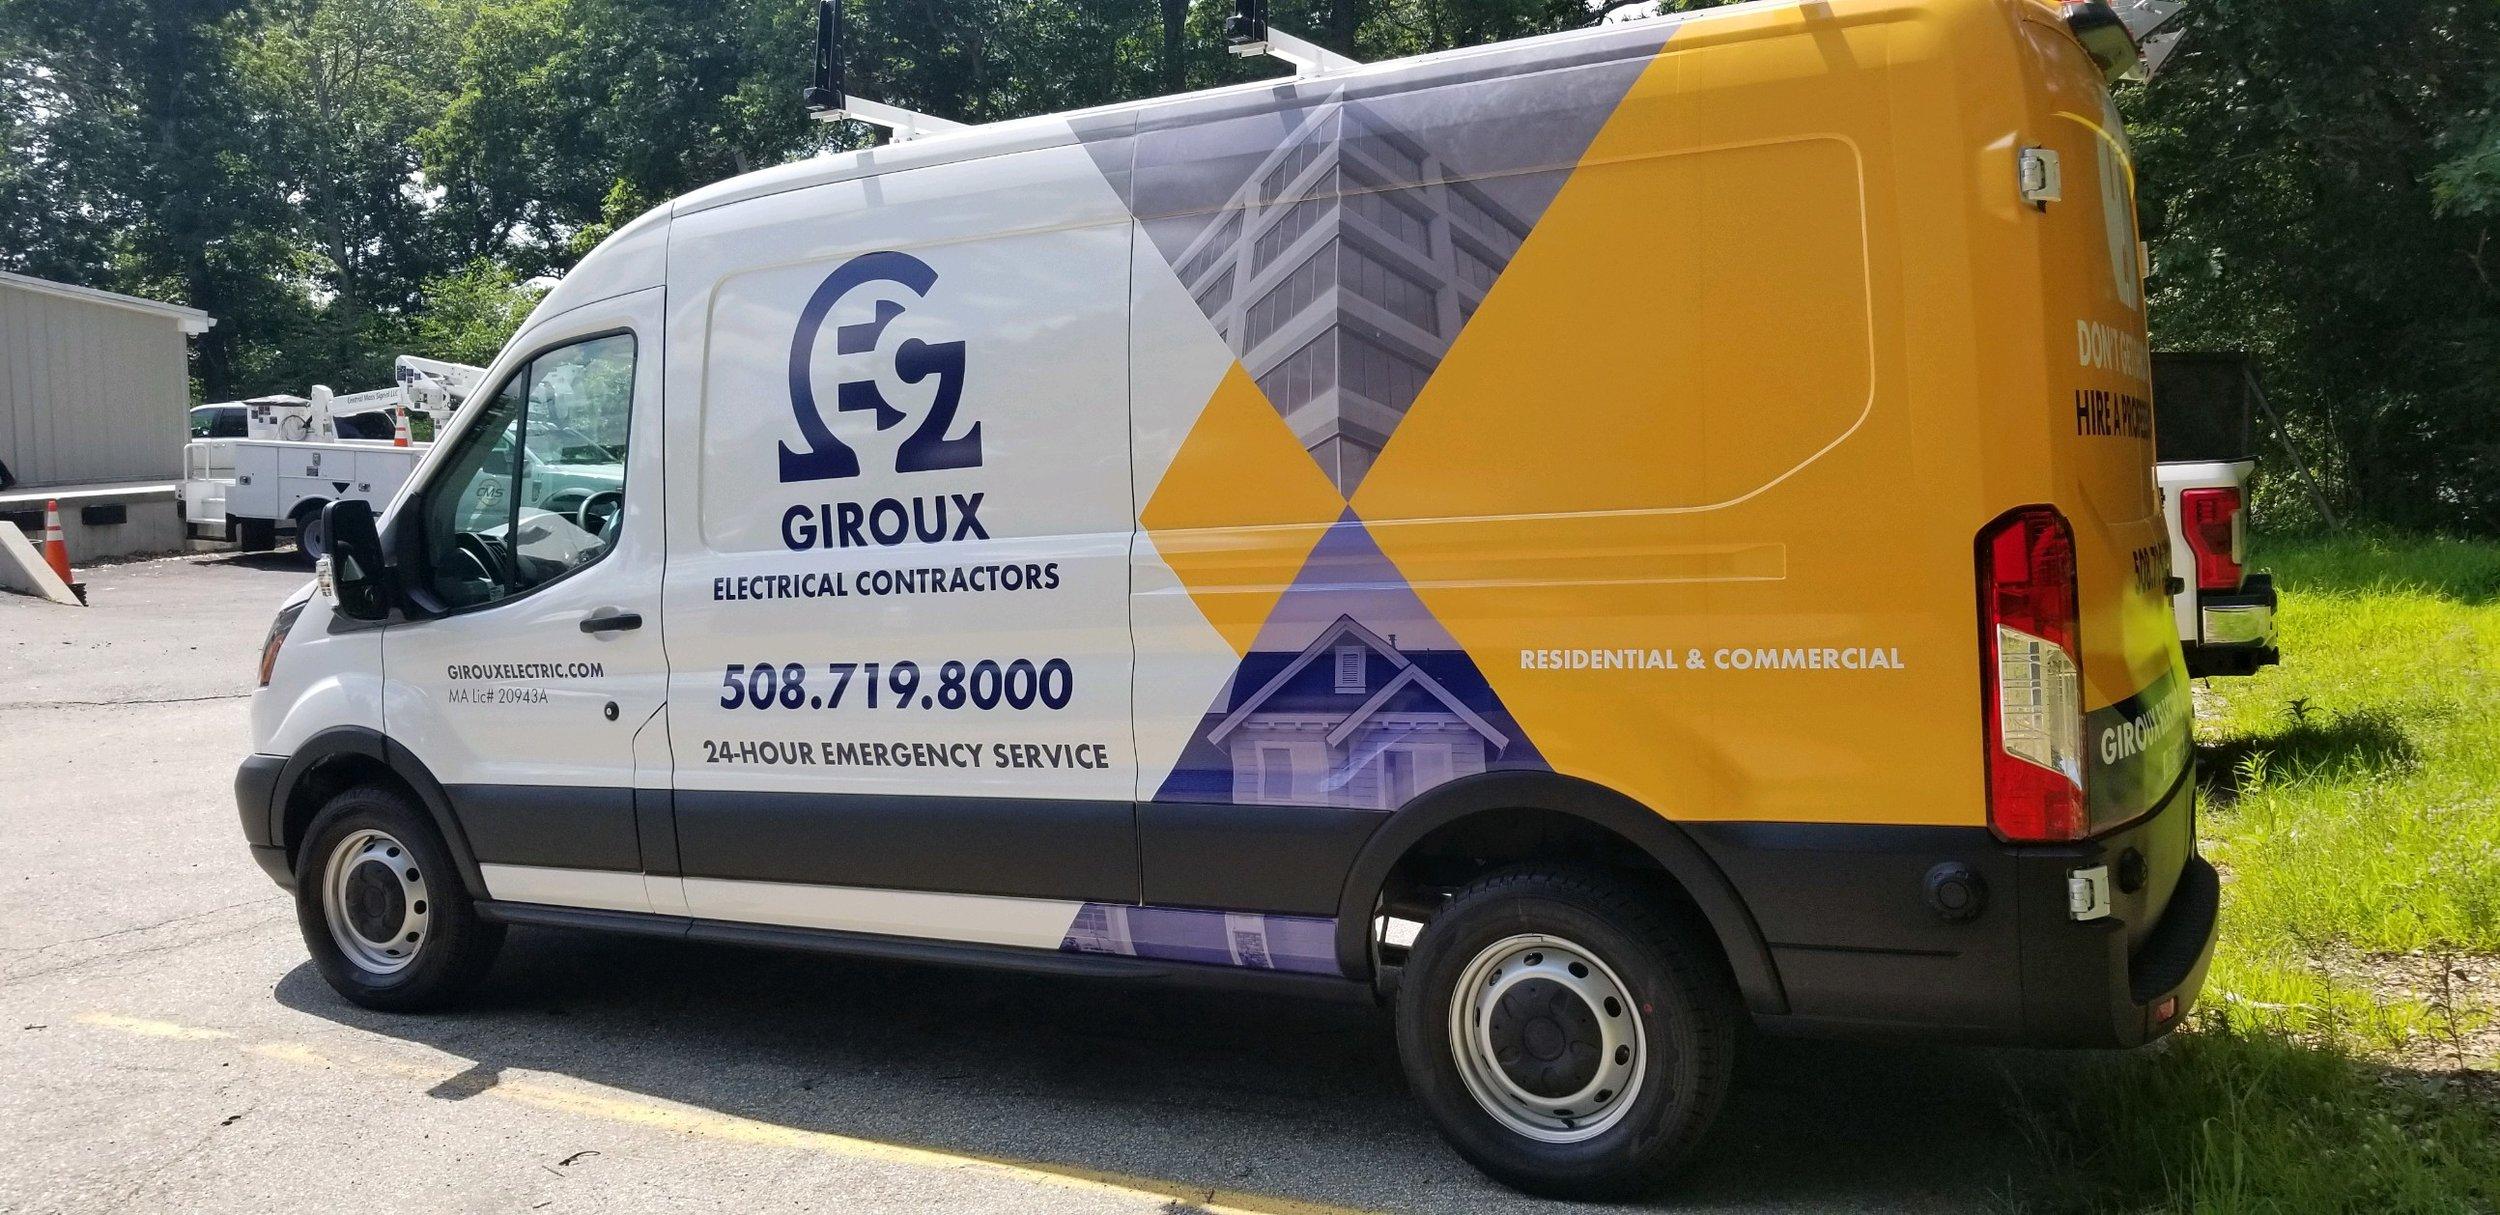 Studio-Eighty-Seven-Branding-And-Logo-Design-GEC-Vehicle-Wrap.jpg